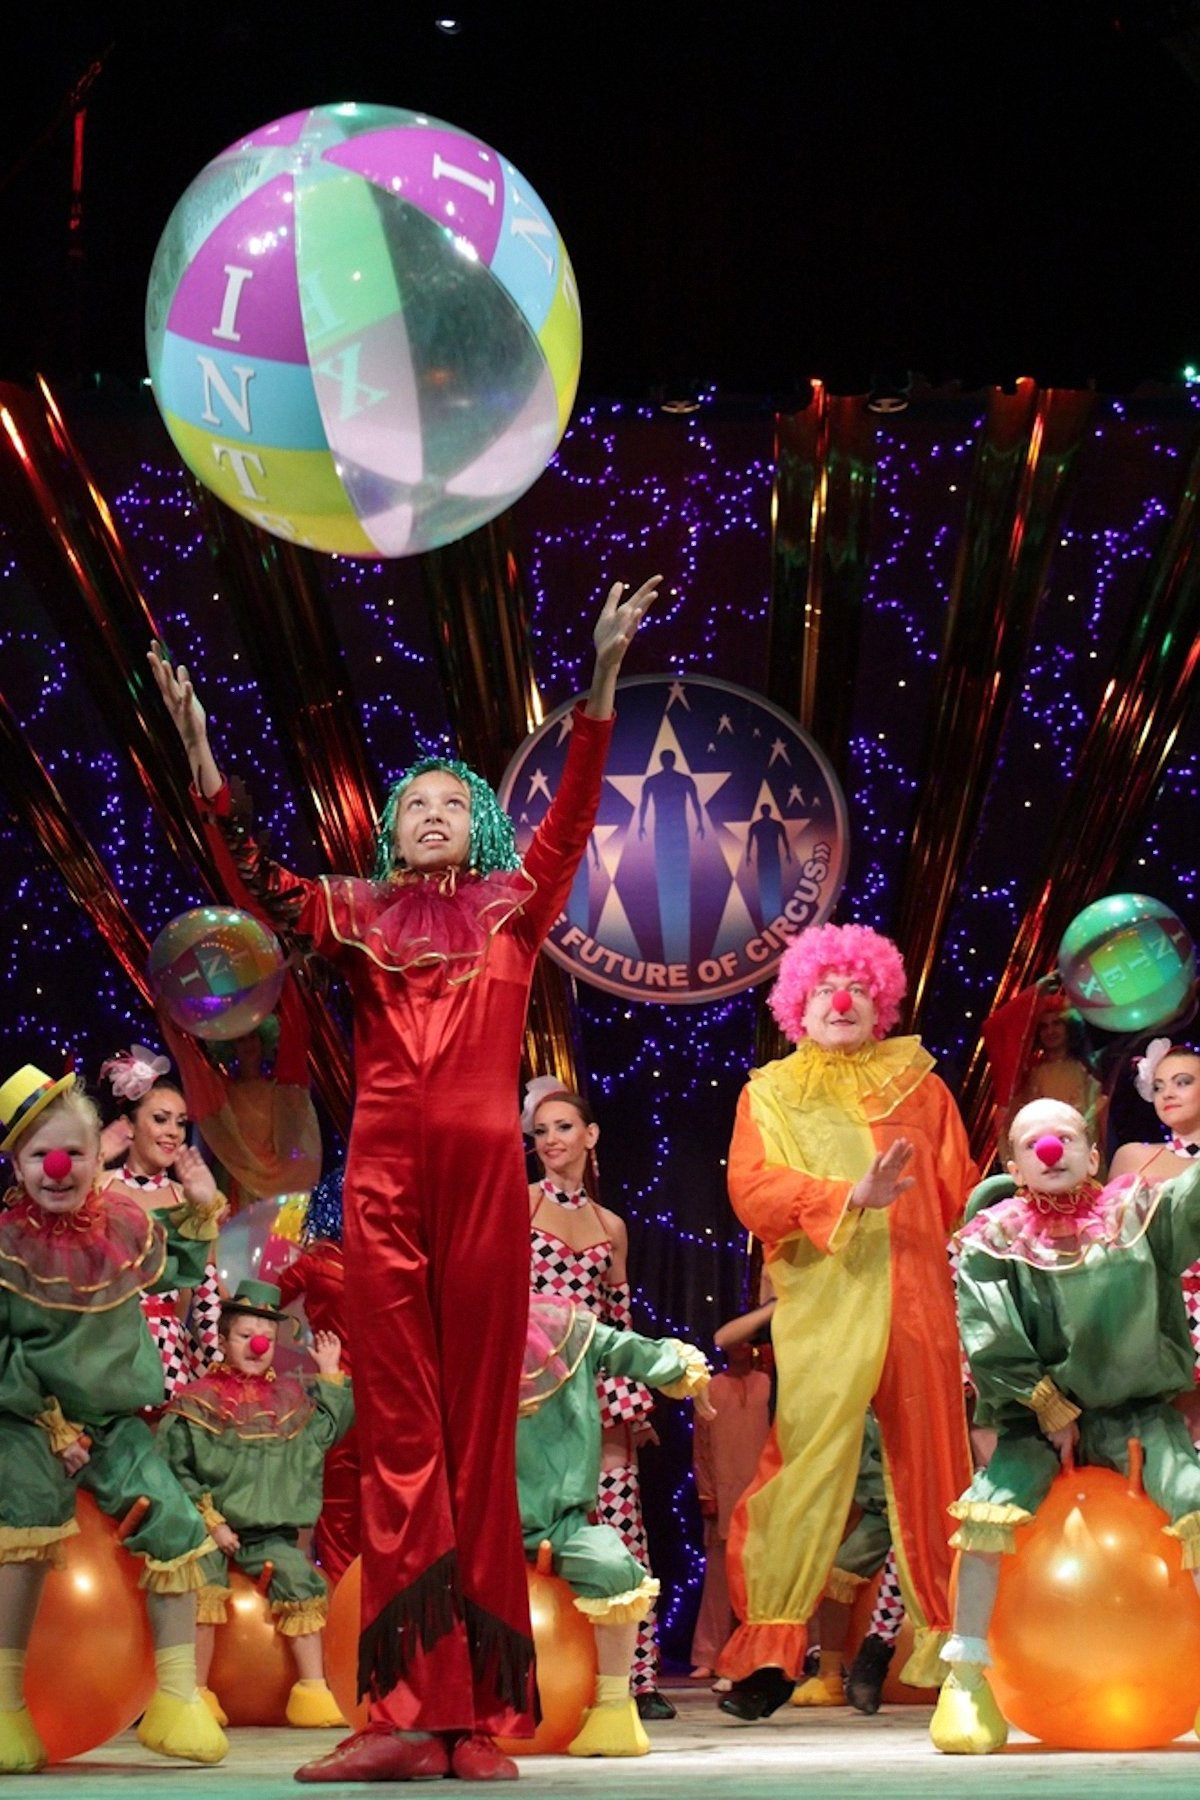 00 lnr lugask pr circus of the future 06 041015